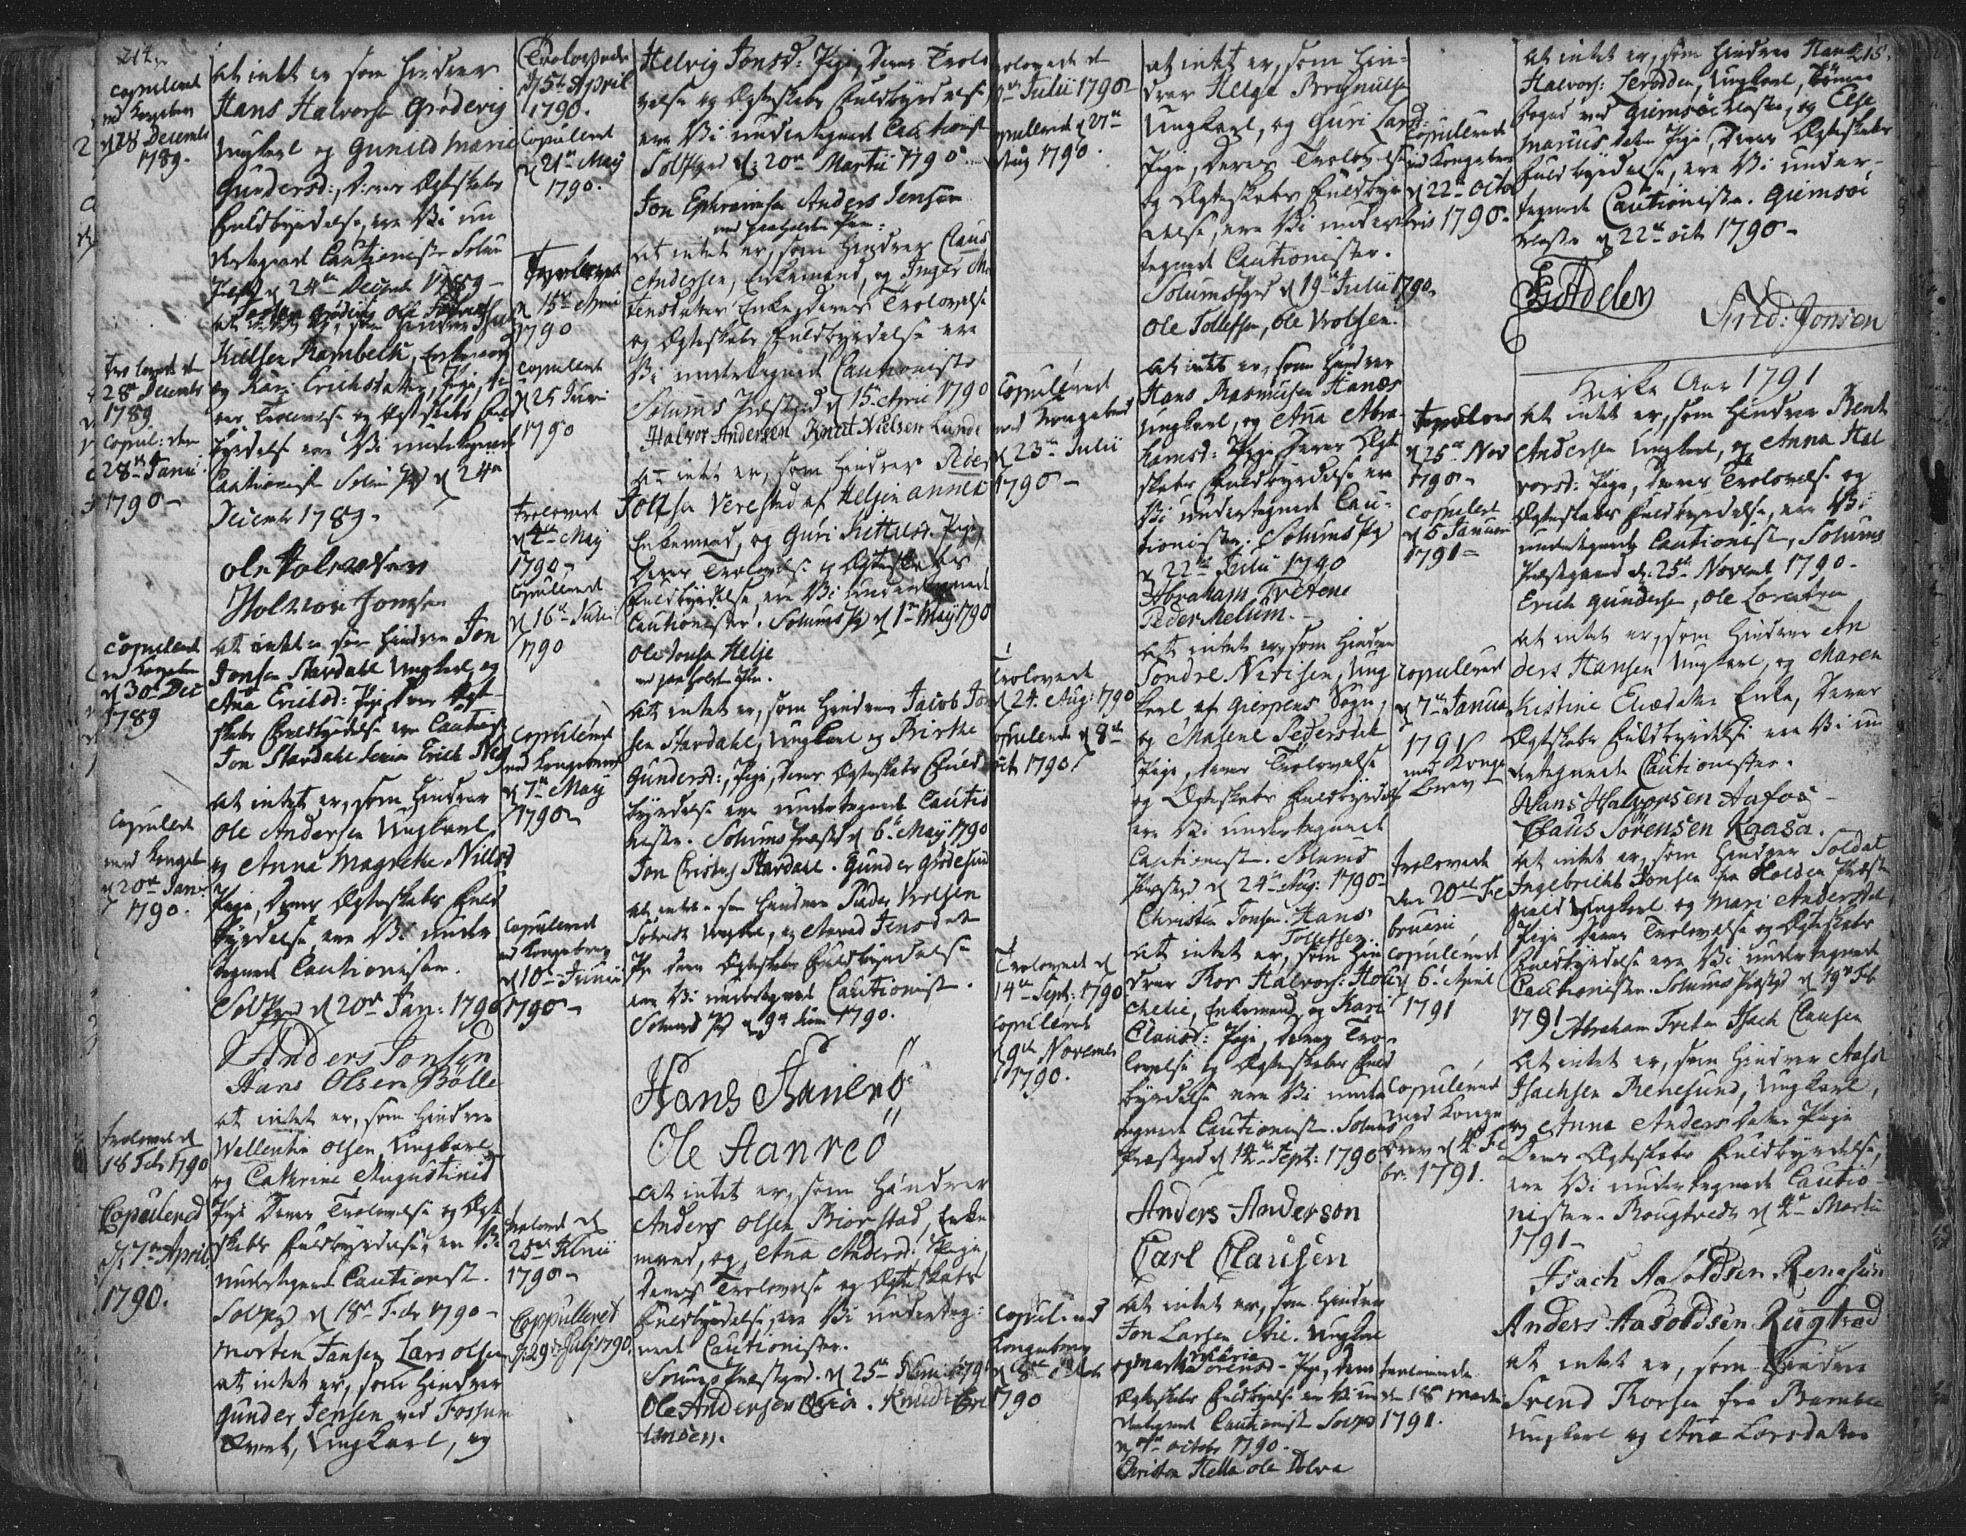 SAKO, Solum kirkebøker, F/Fa/L0003: Ministerialbok nr. I 3, 1761-1814, s. 214-215